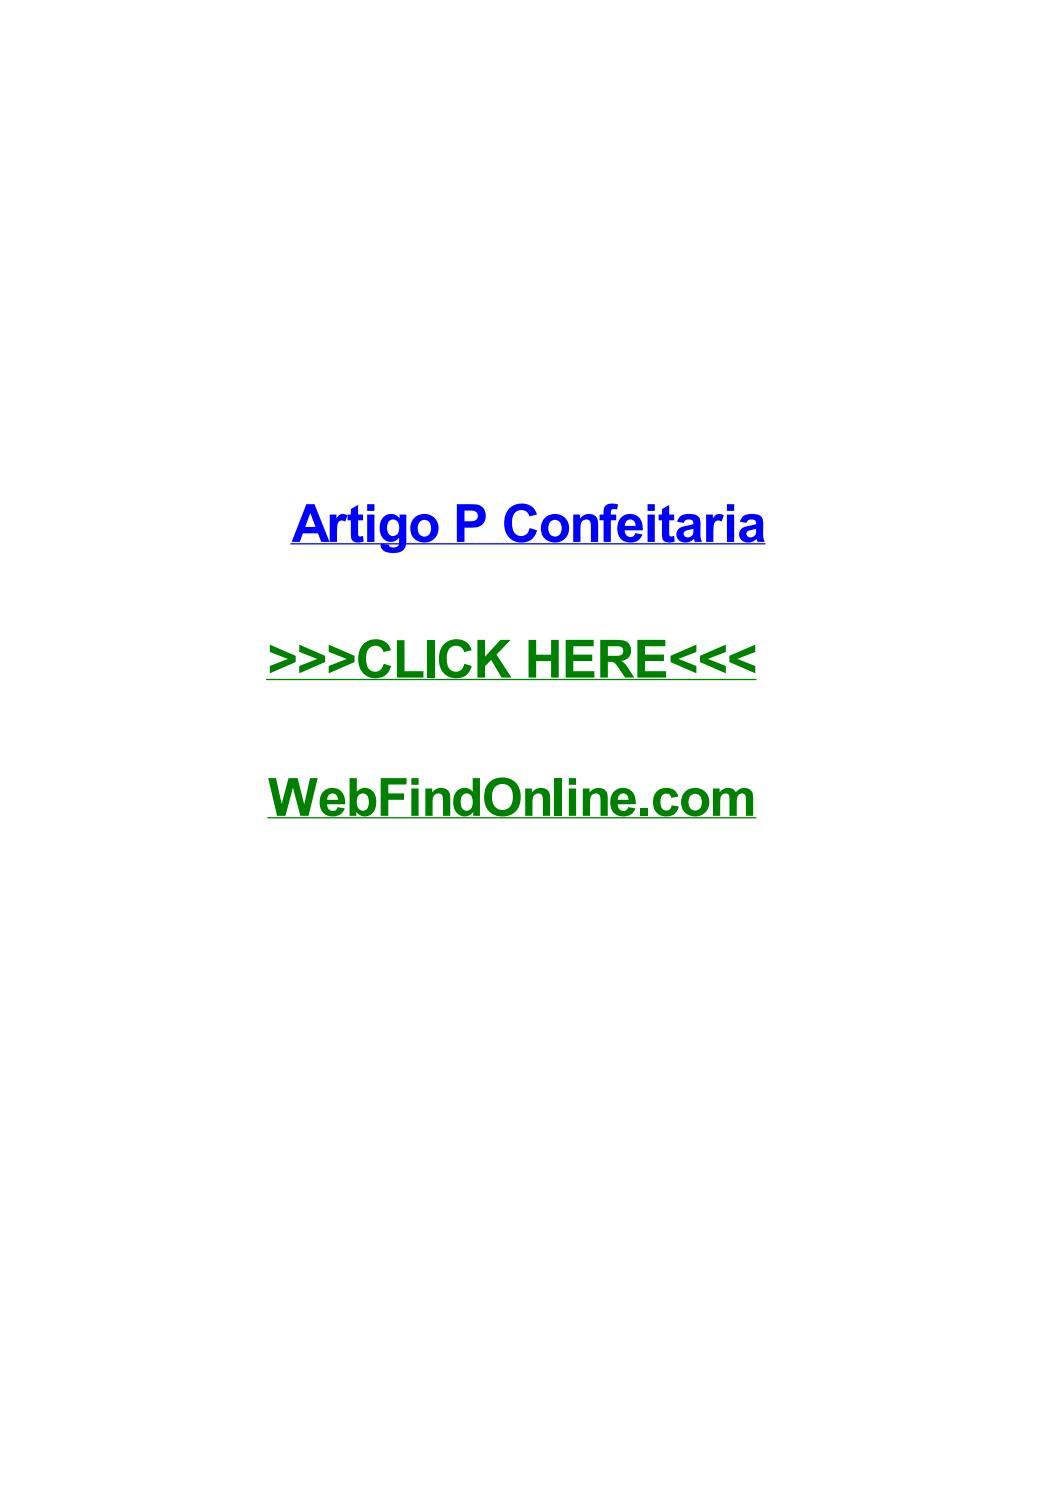 Artigo p confeitaria by crystalkdyy issuu ccuart Gallery